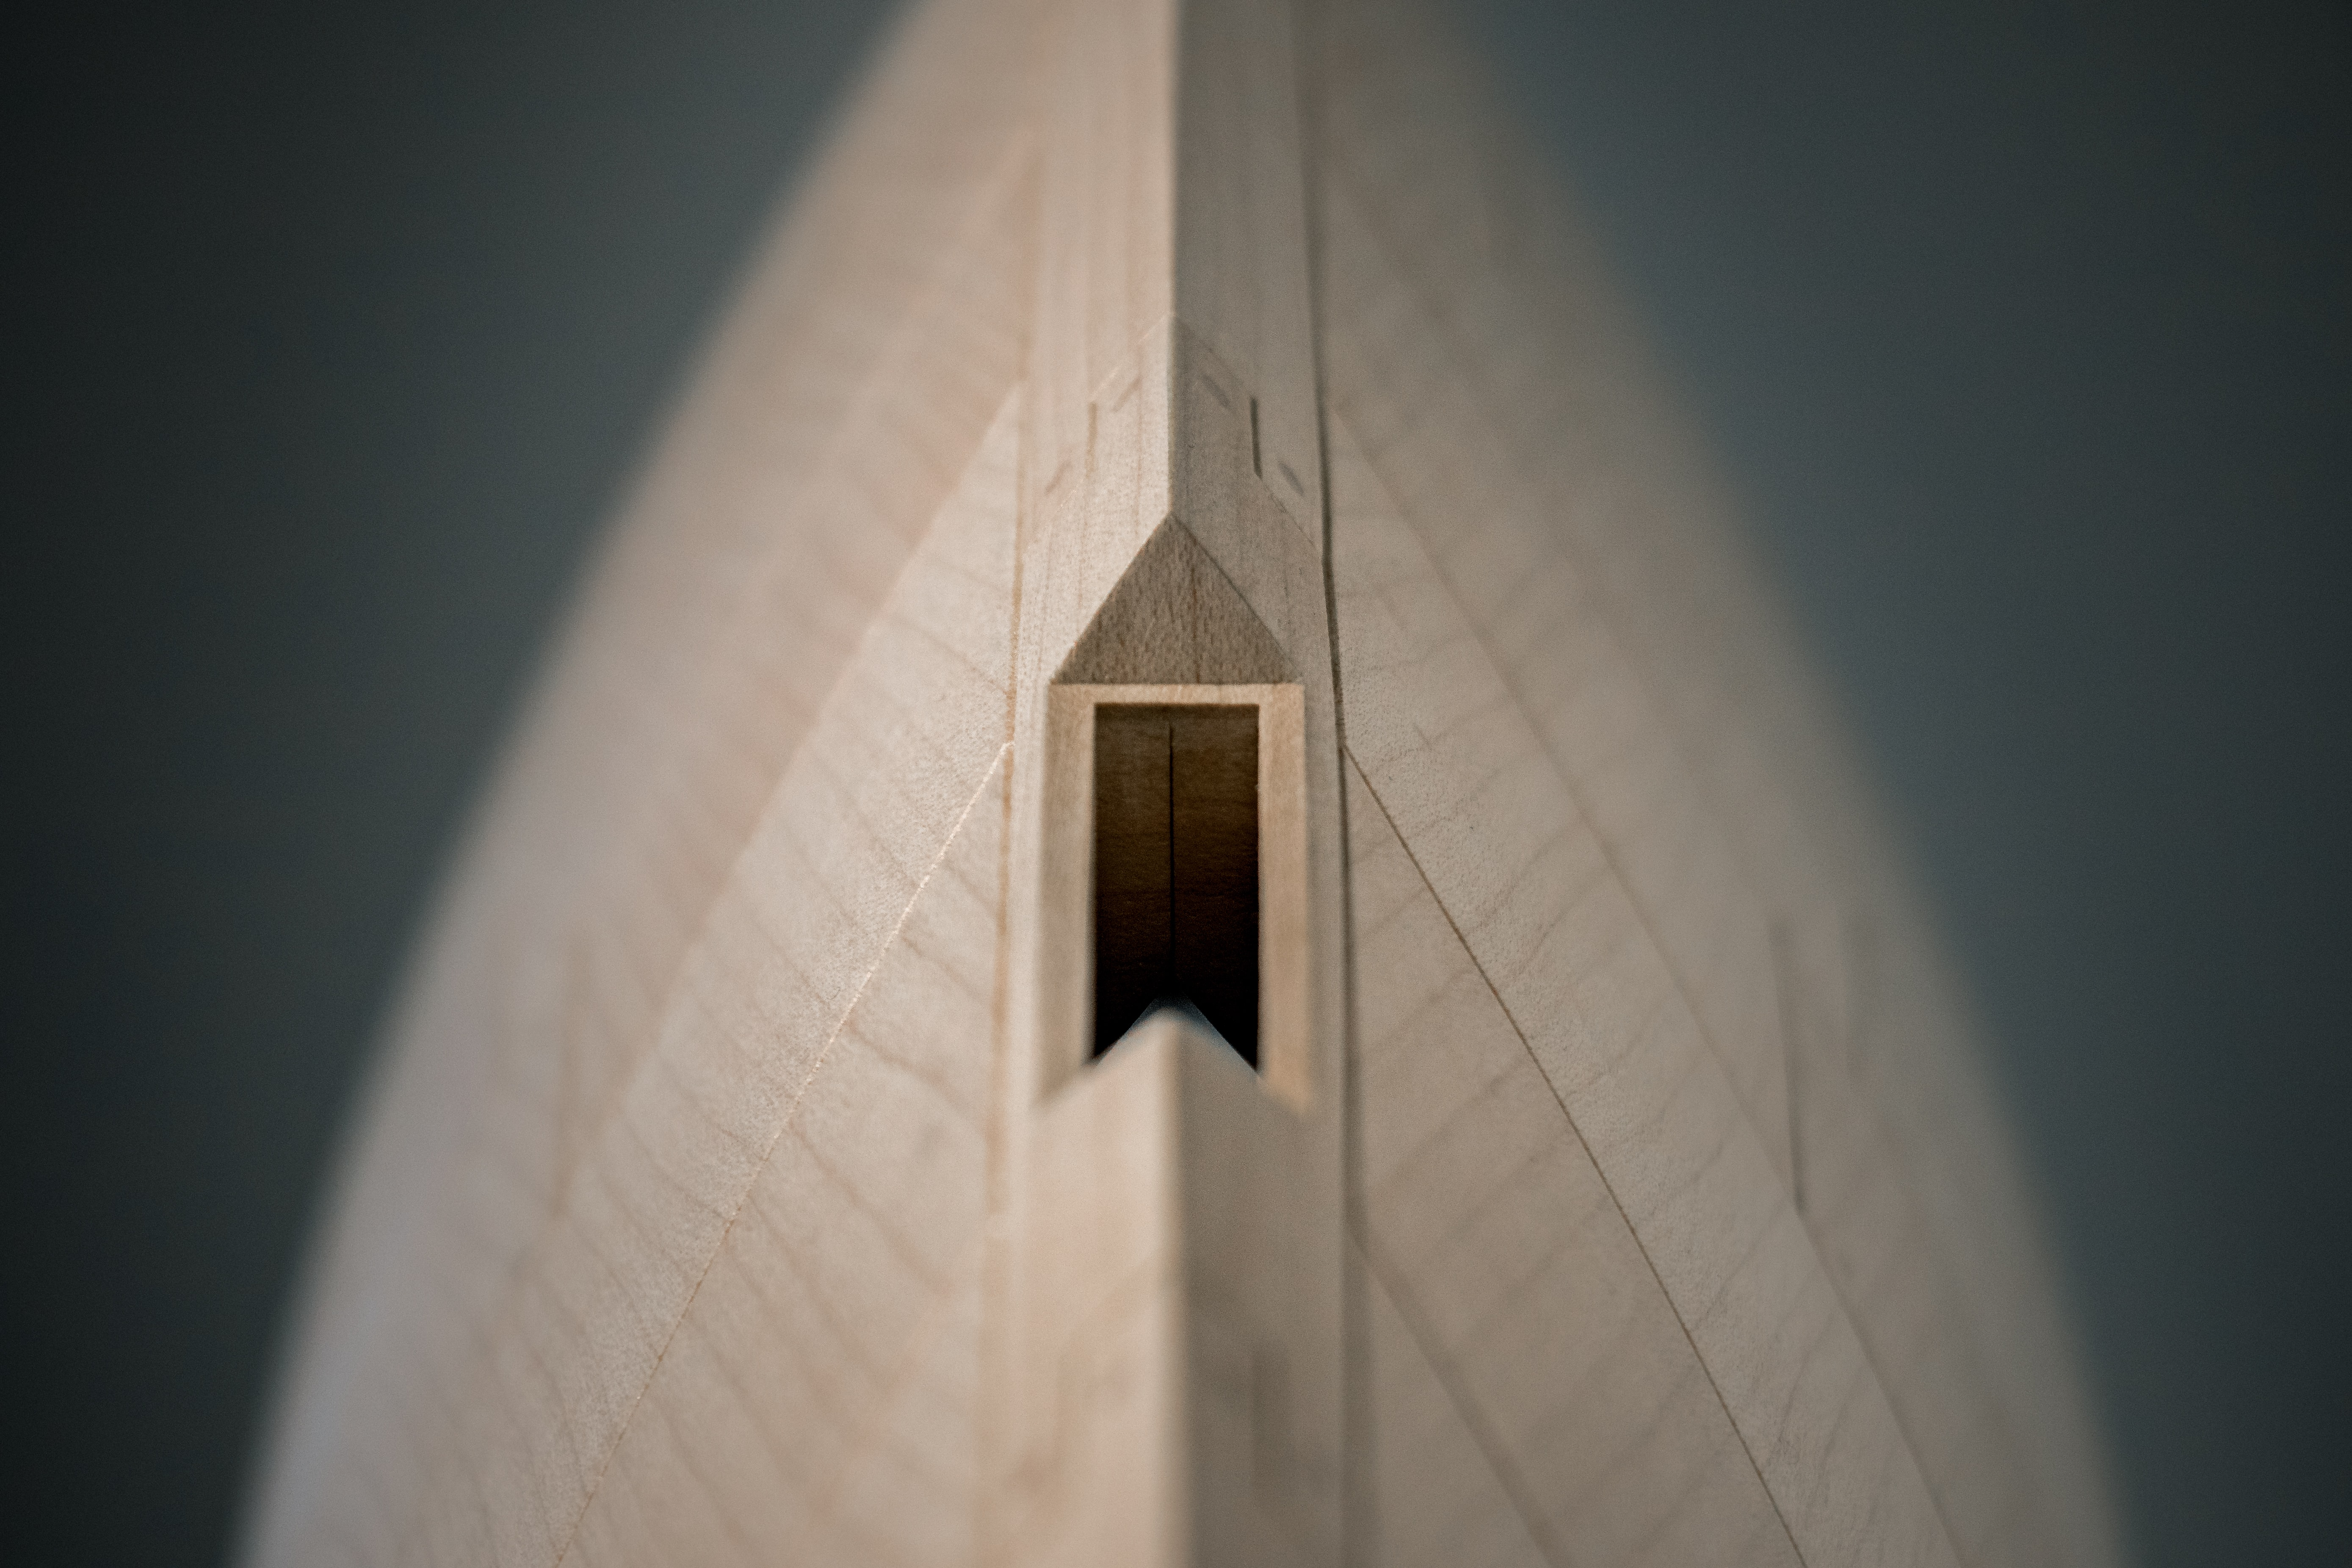 closeup photography of wooden coin bank